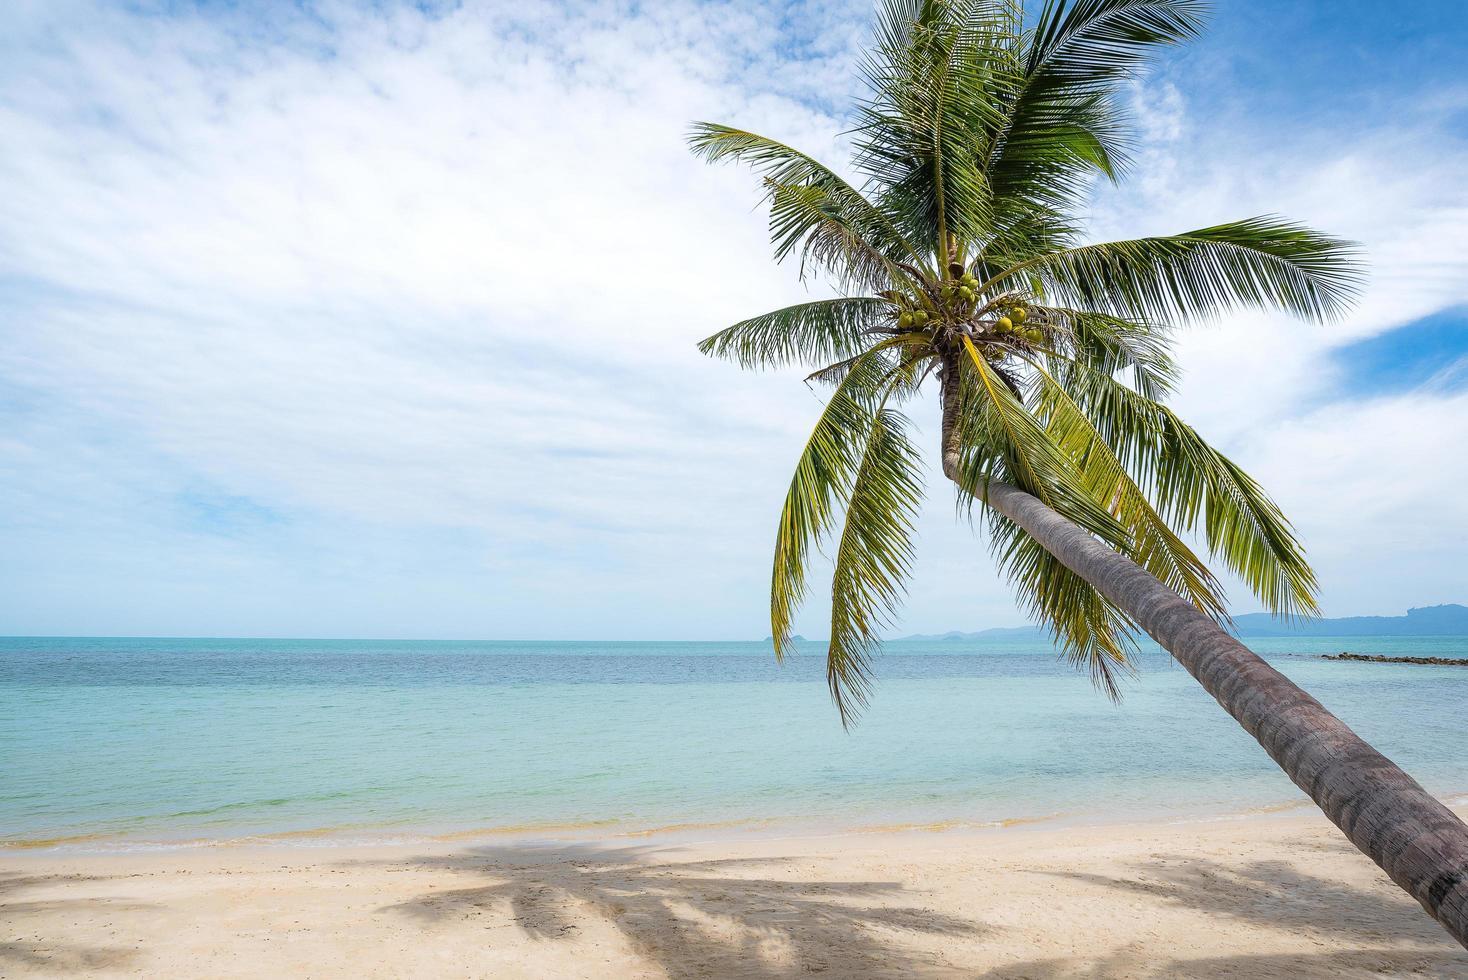 palmträd på tropisk strand foto